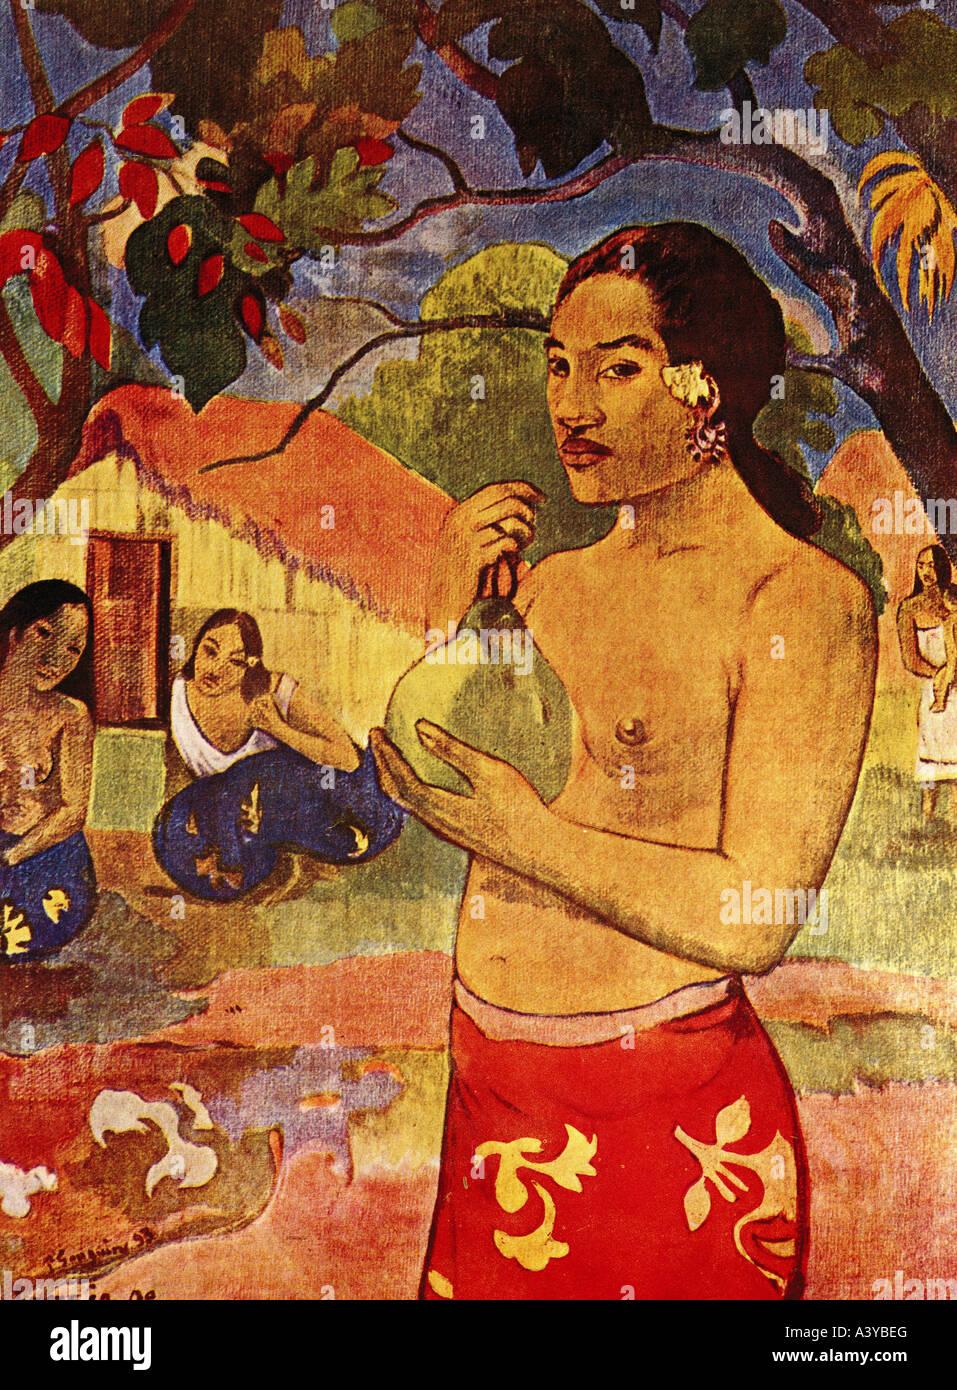 """fine arts, Gauguin, Paul, (1848 - 1903), painting, ""Tahiti woman with fruit"", 1893, oil on canvas, Puschkin museum, Stock Foto"